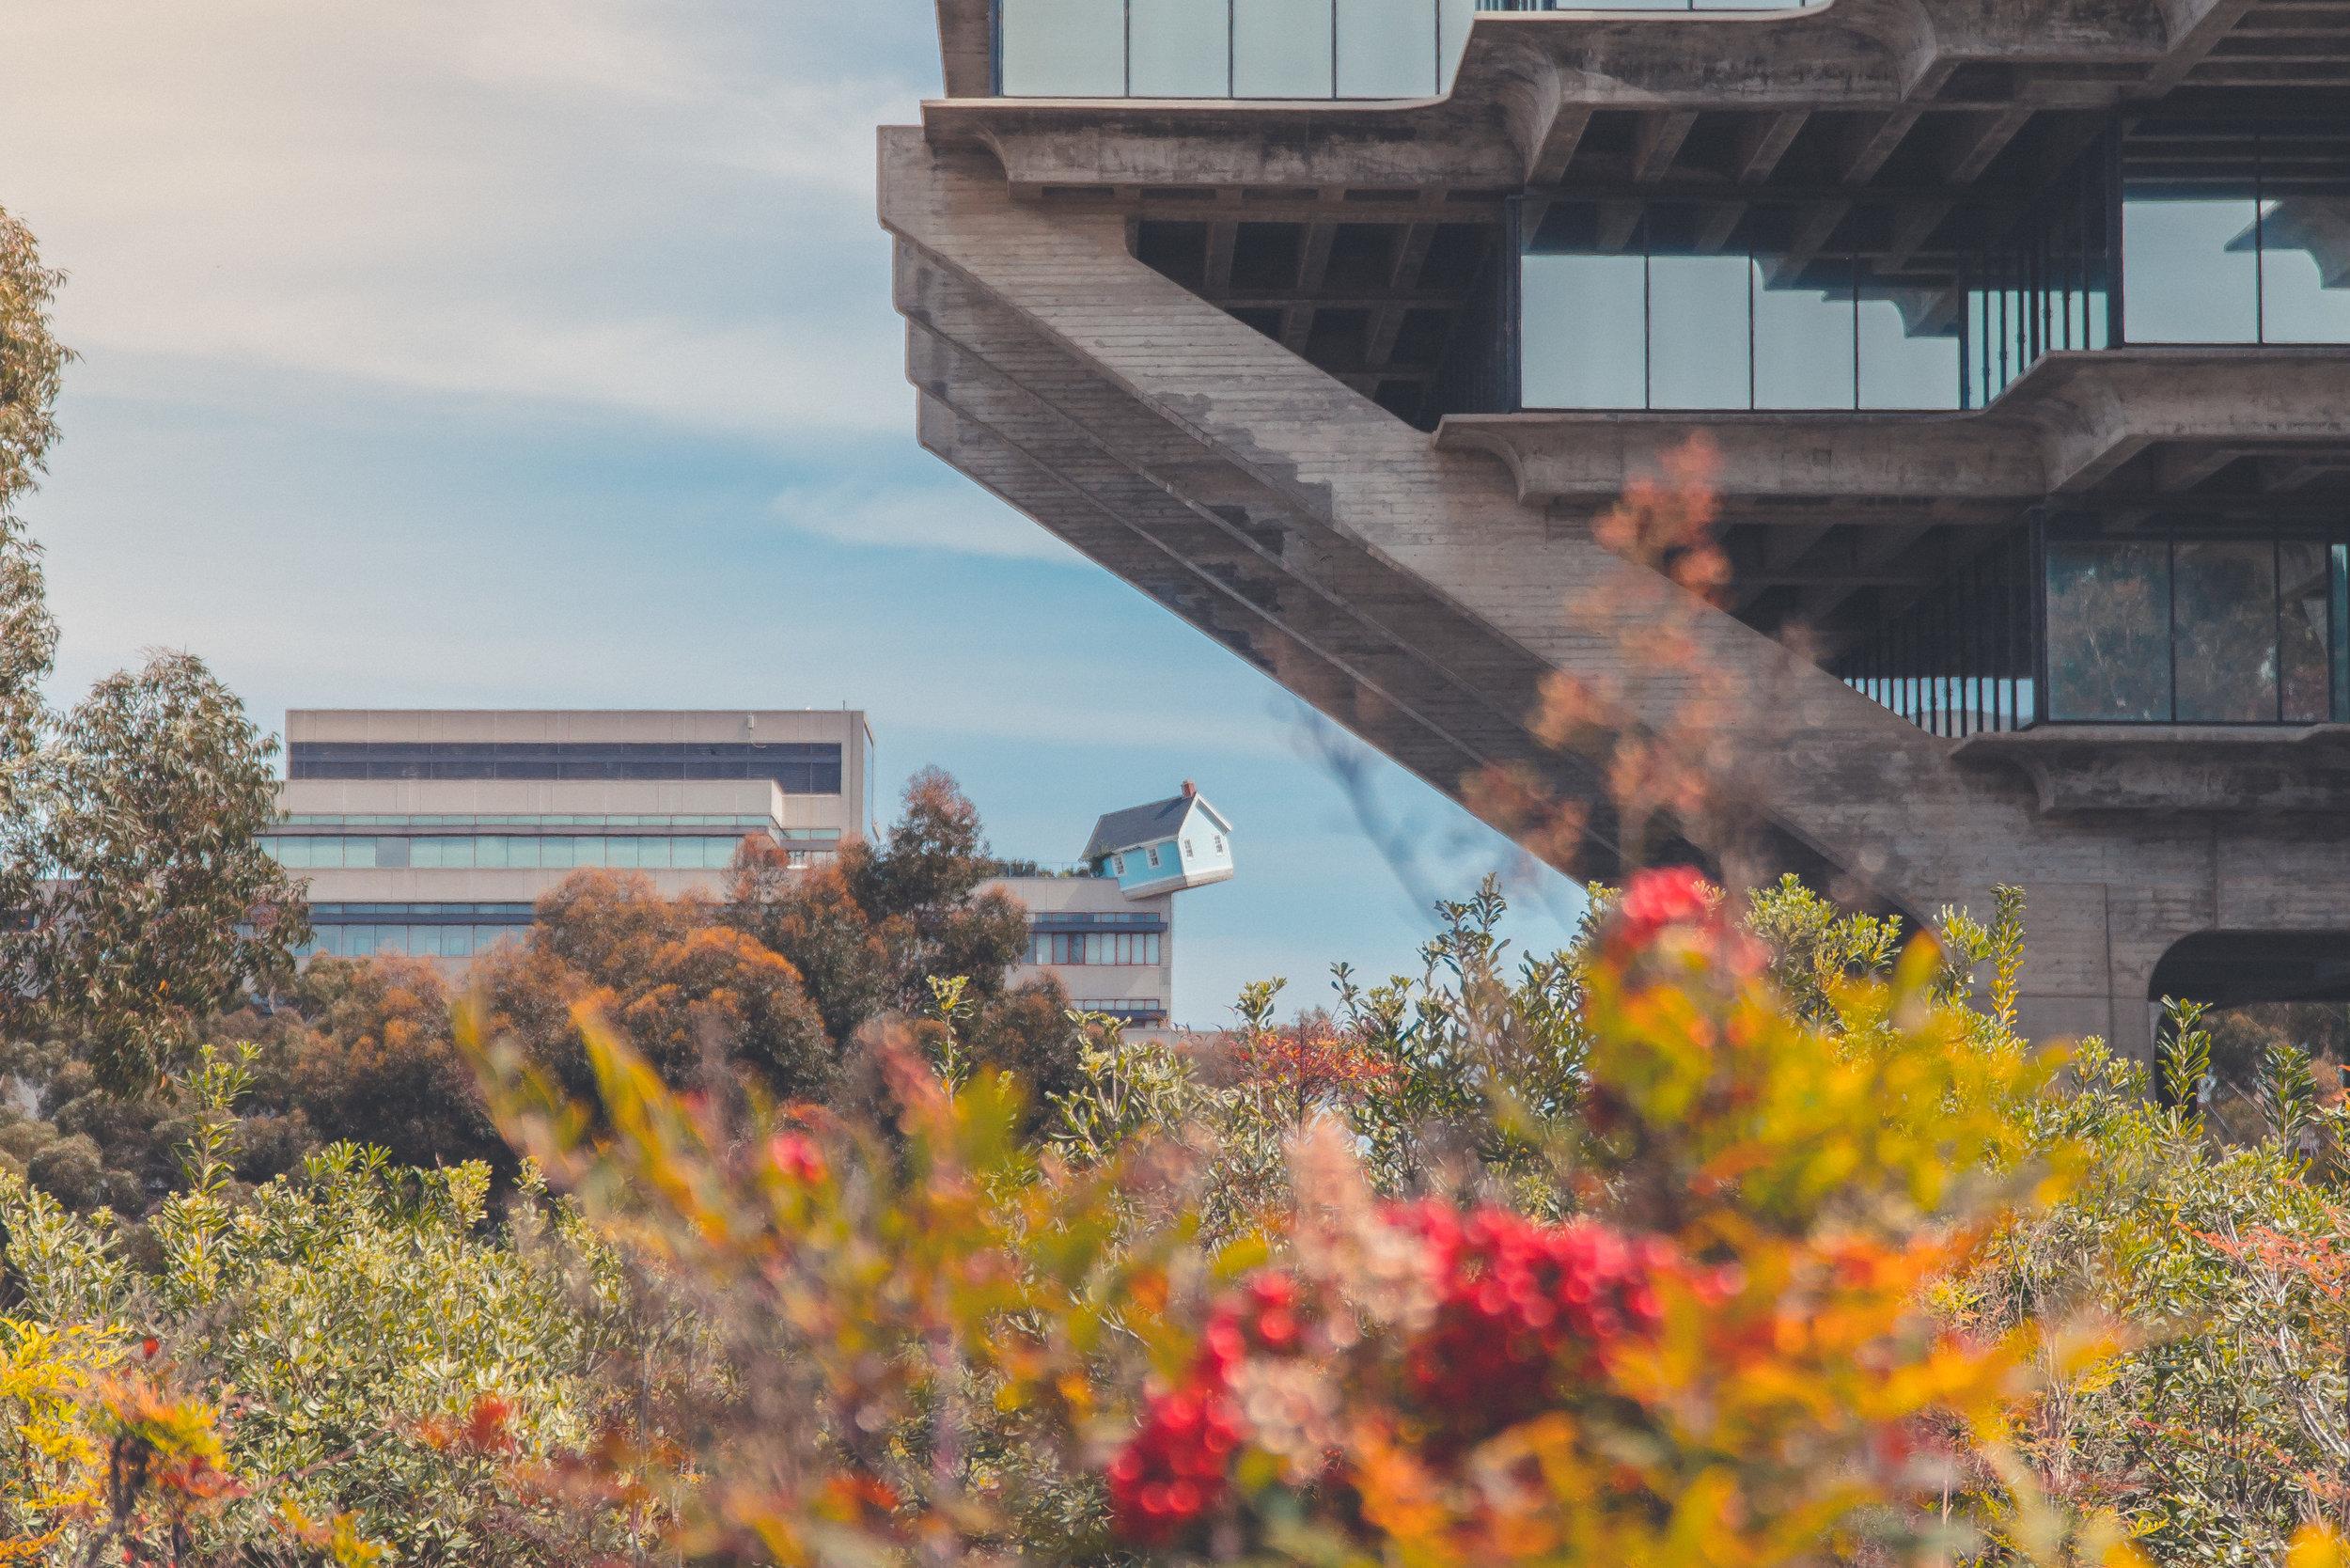 University of California San Diego - Engineering Building